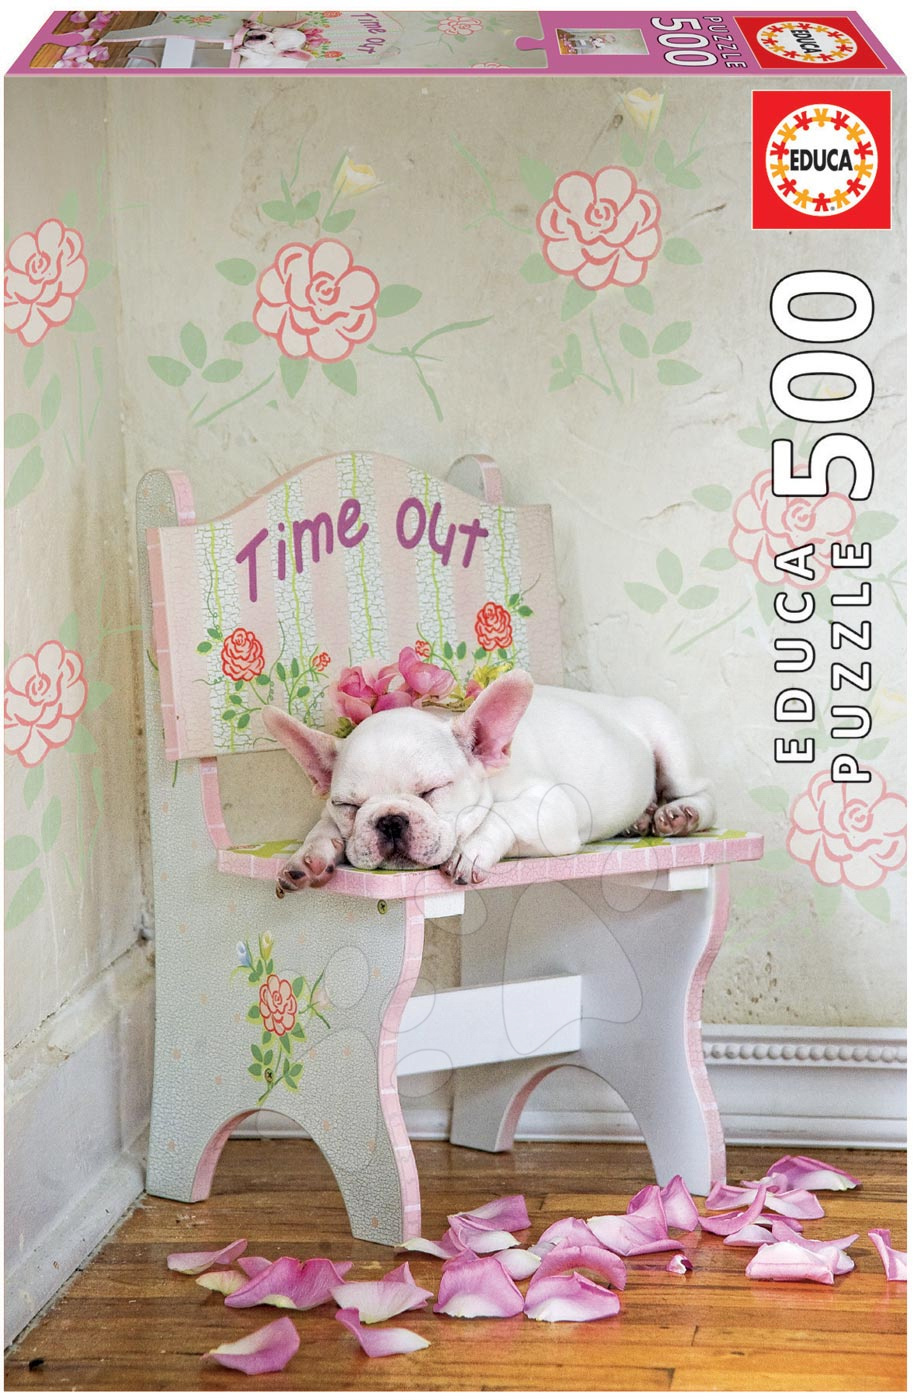 Puzzle 500 dielne - Puzzle Genuine Taking time out, Lisa Jane Educa 500 dielov od 11 rokov